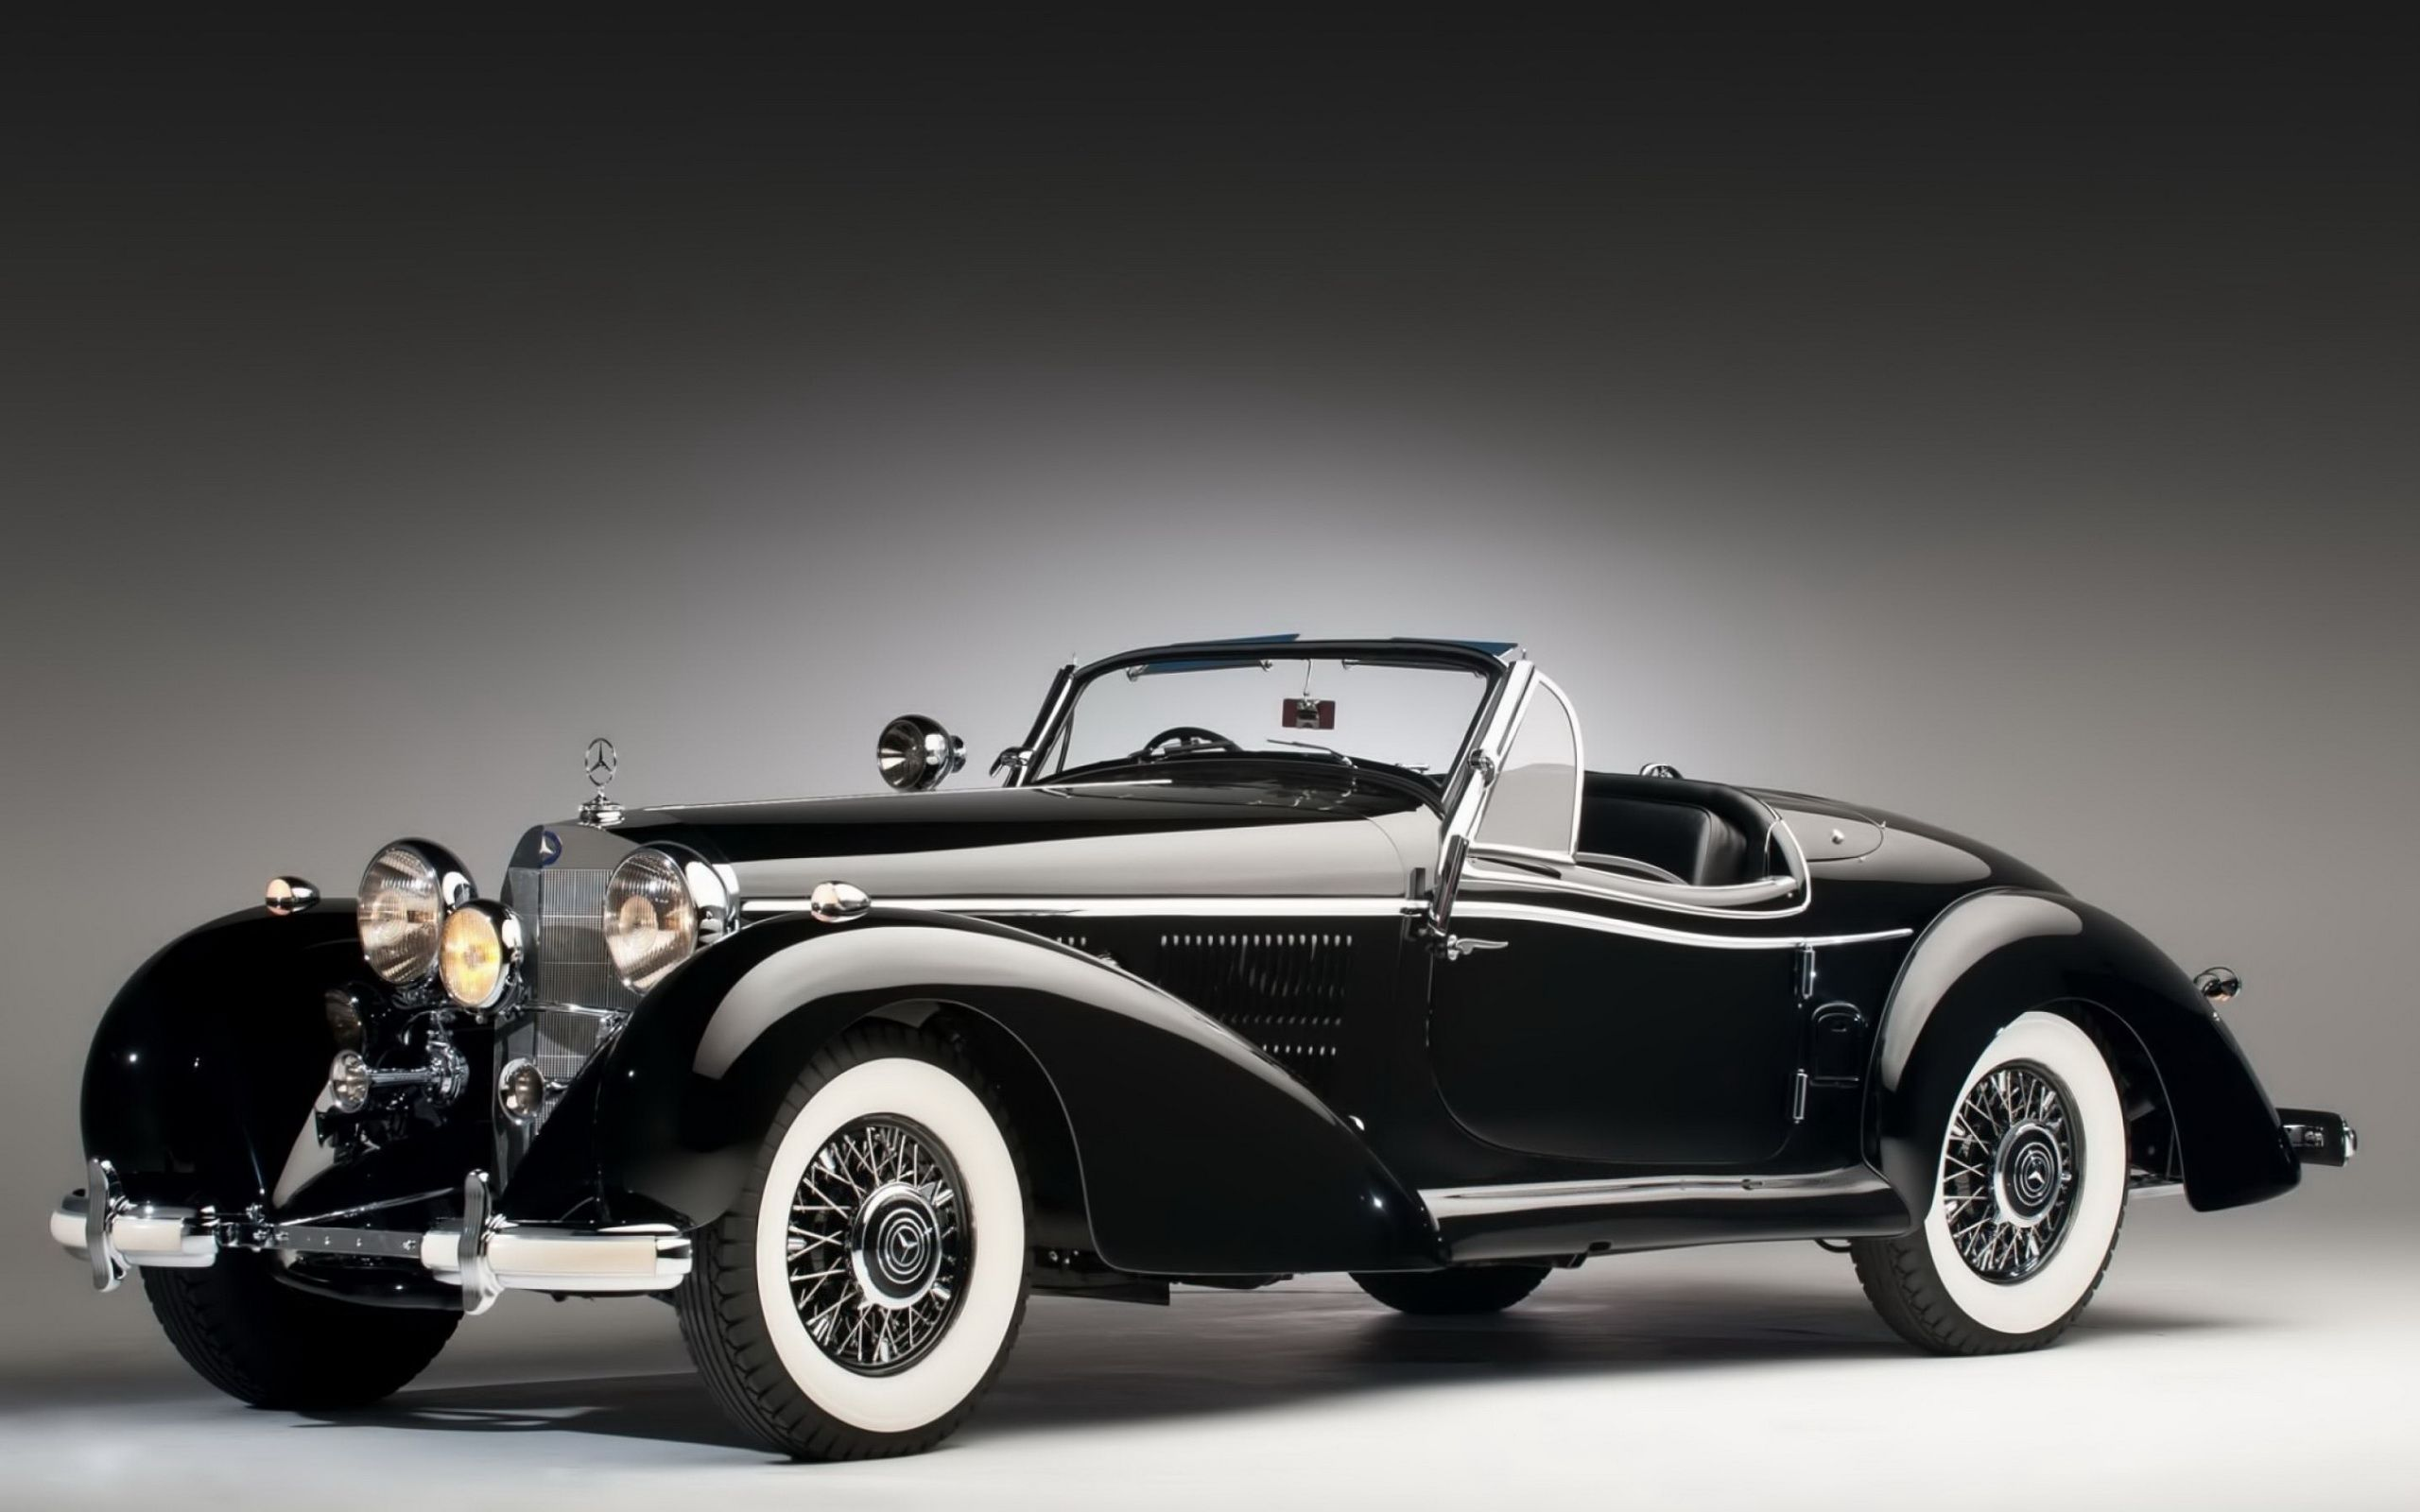 car-black-vintage-cars-convertible-landaulet-cool-2560x1600.jpg 2560×1600 pikseliä